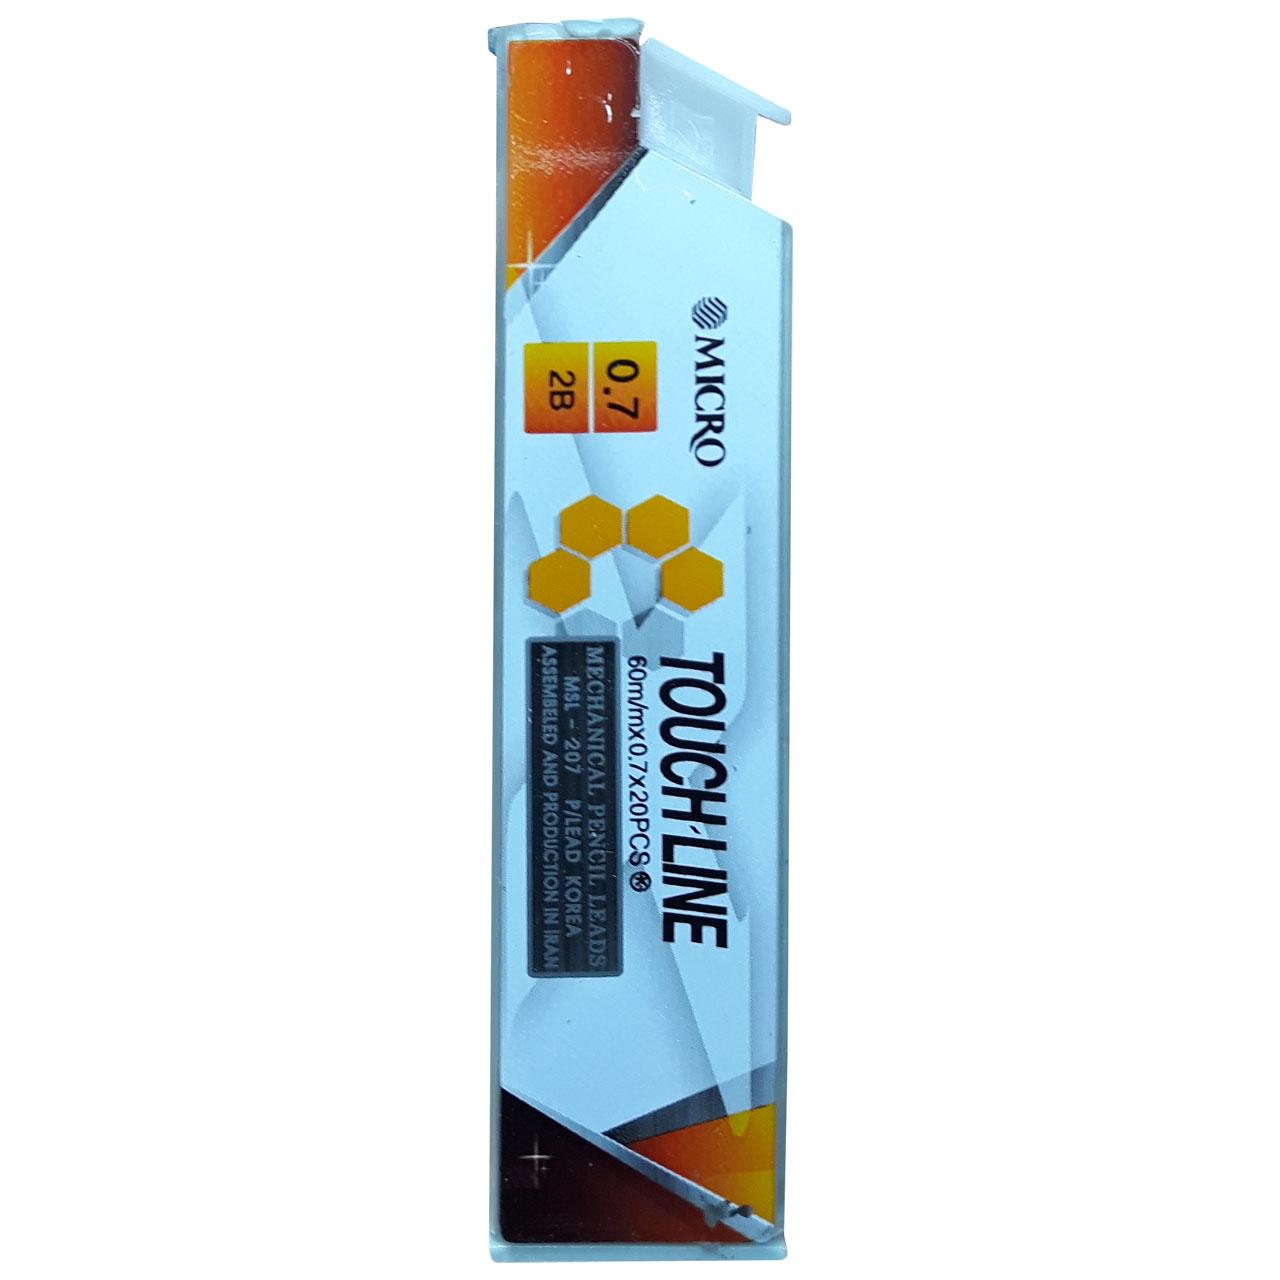 نوک مداد نوکی 0.7 میلی متری میکرو کد 207 بسته 12 عددی